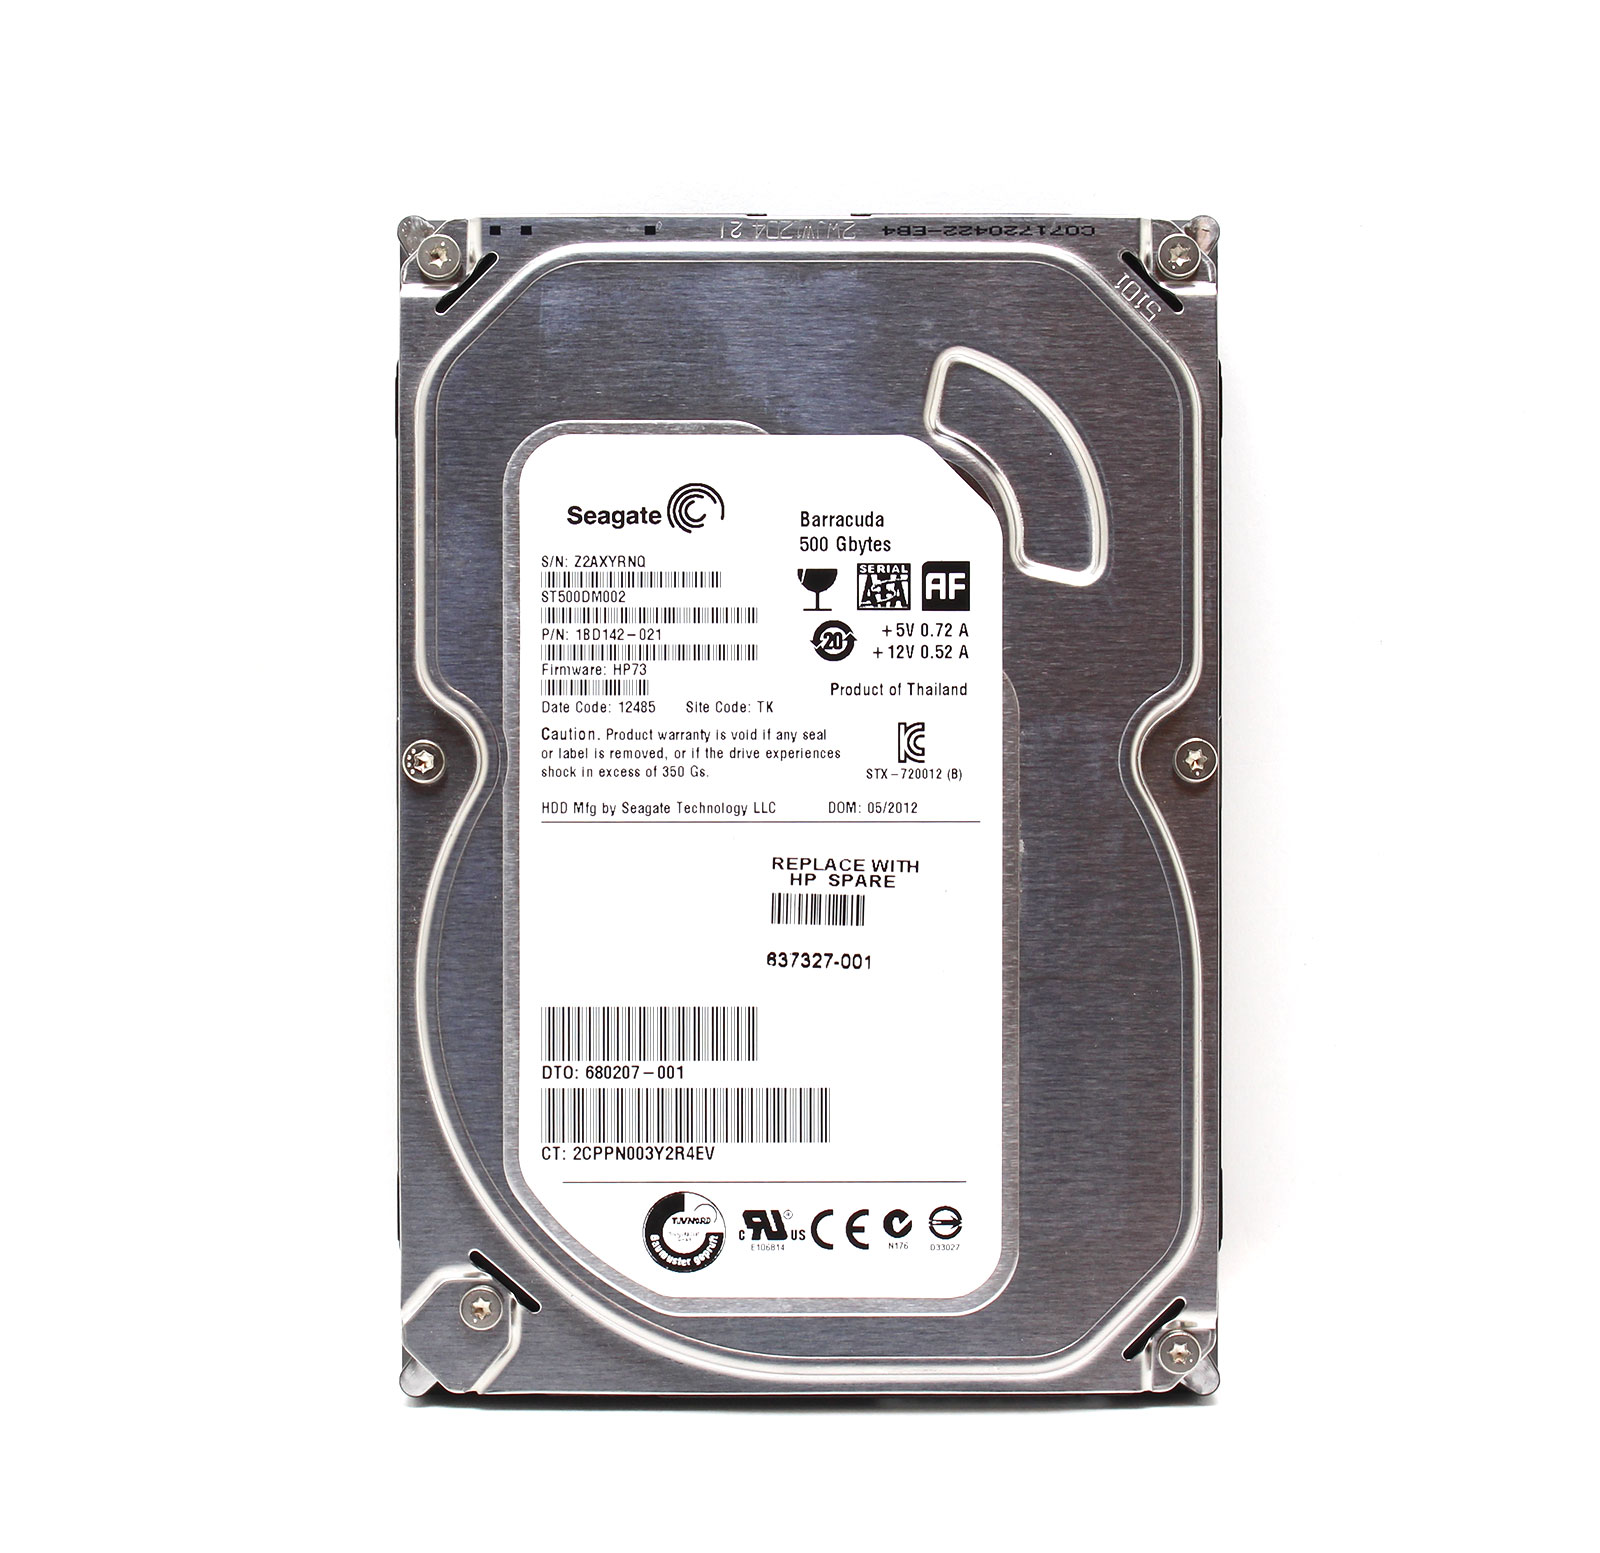 SecurePac Hard Drive 500GB HDD System Pull